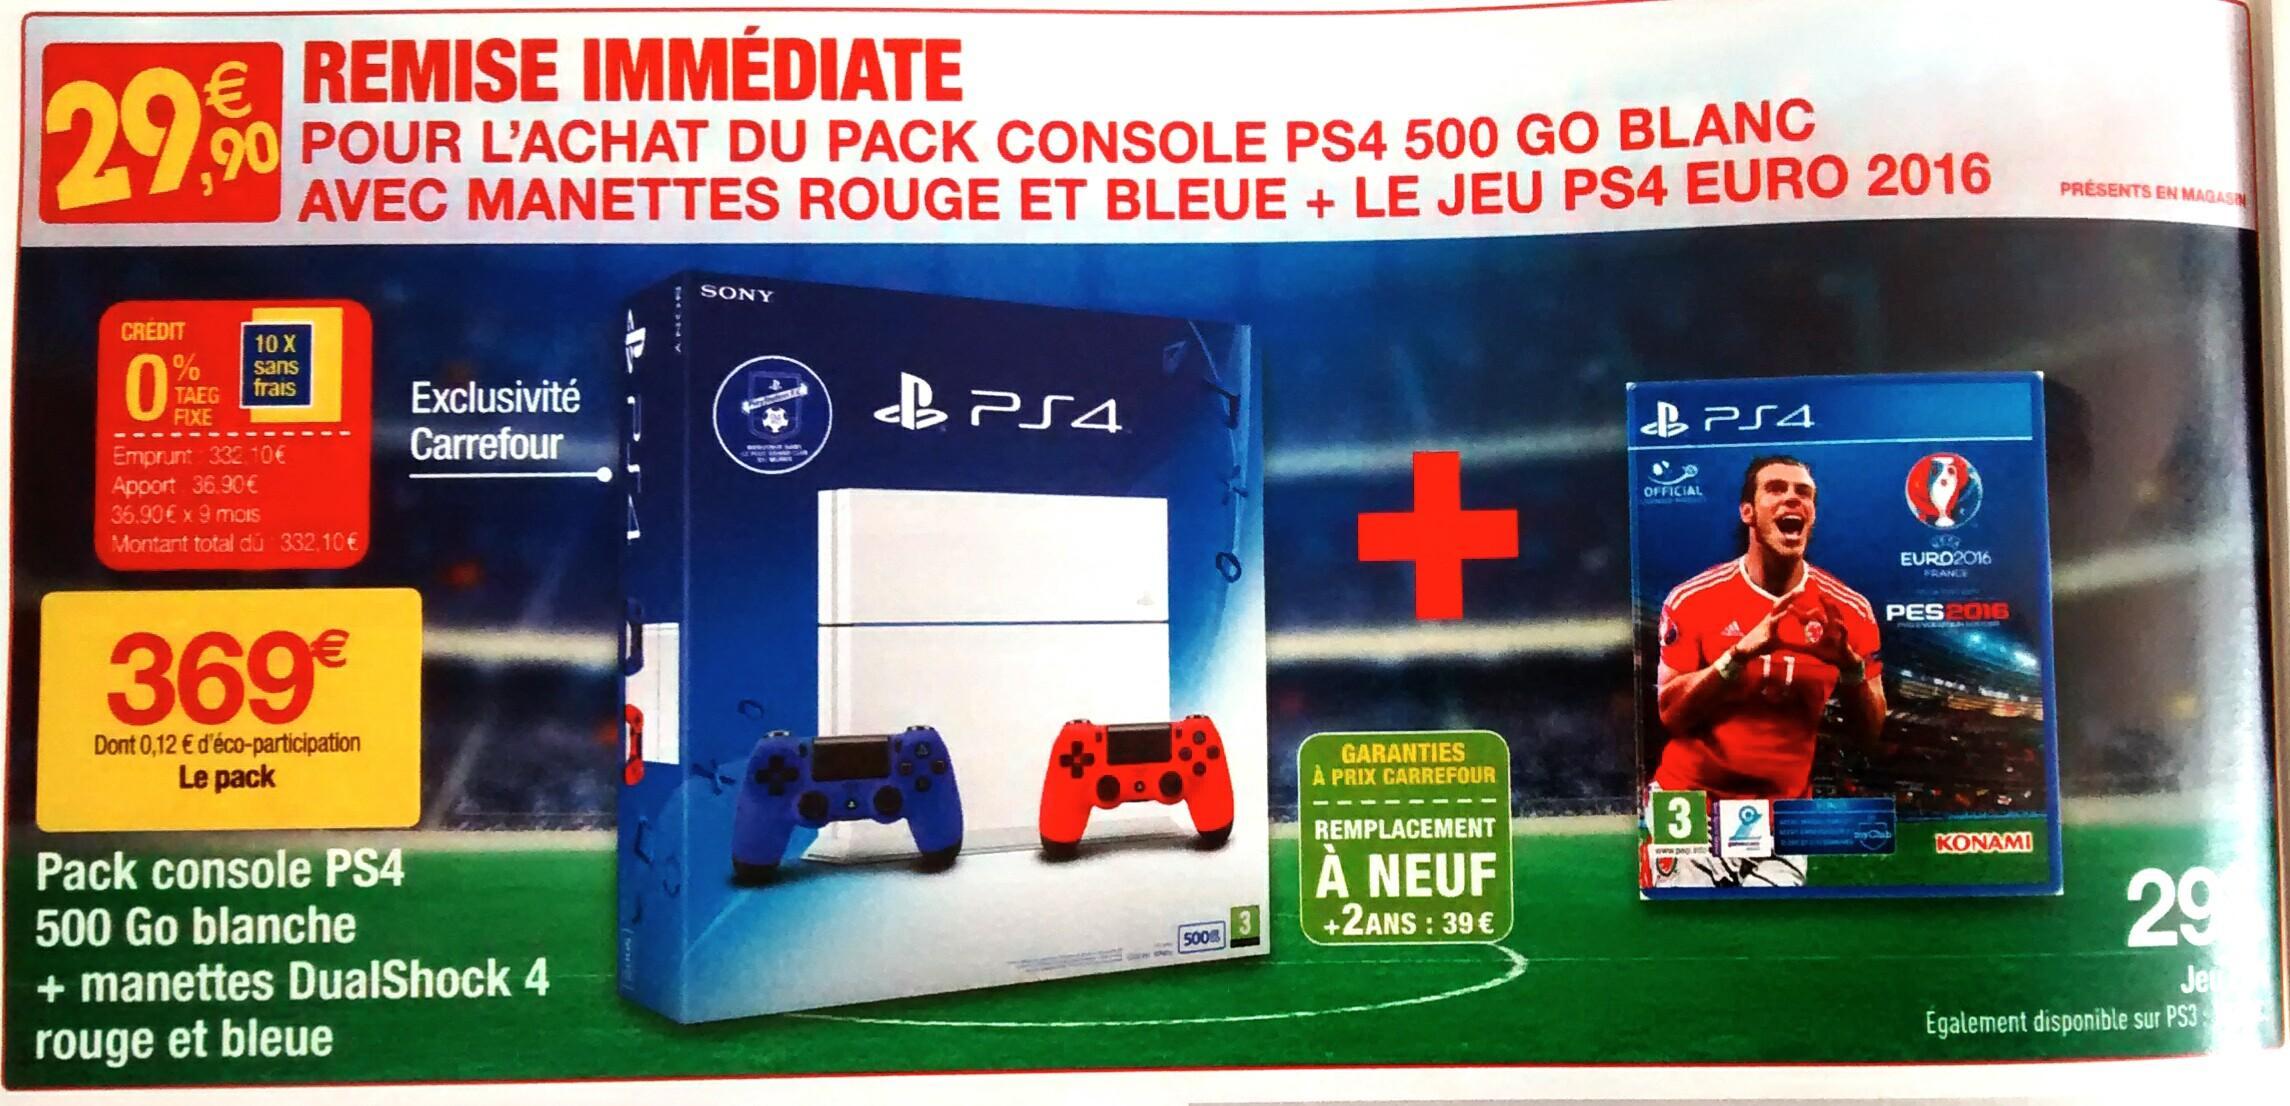 pack console ps4 500go blanche 2 manettes dualshock4 bleue et rouge pes euro 2016. Black Bedroom Furniture Sets. Home Design Ideas